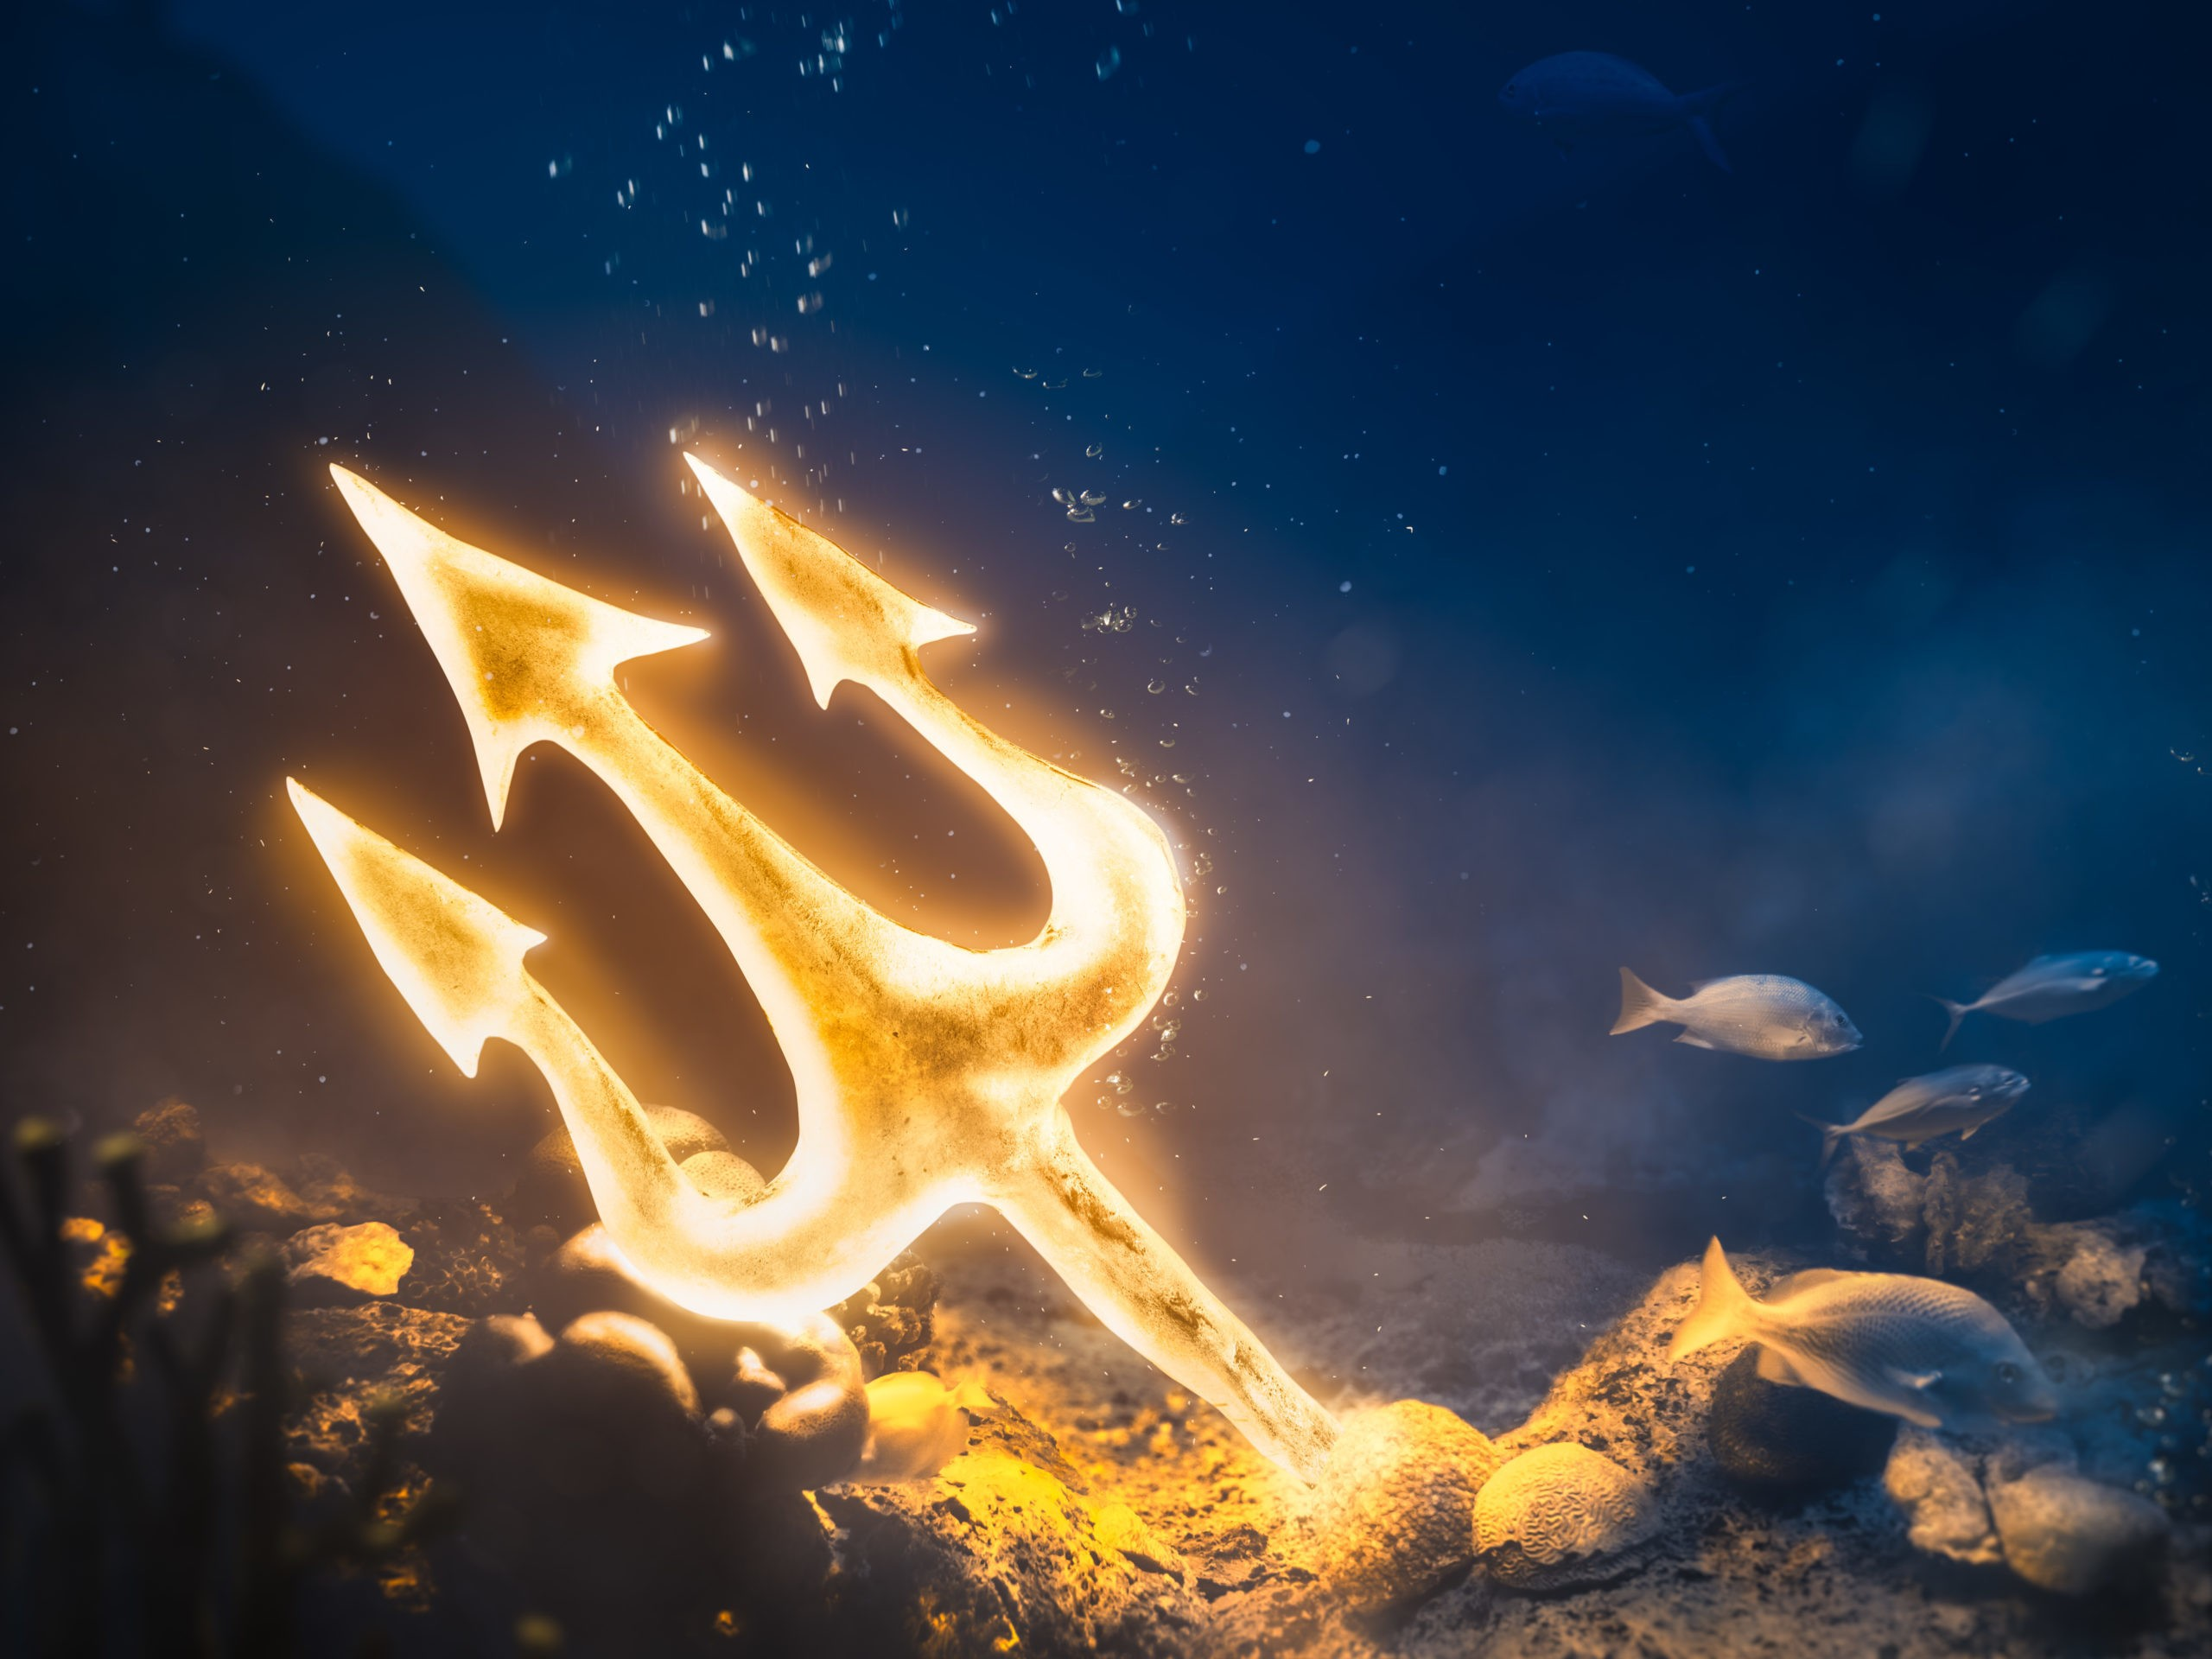 poseidon trident at the bottom of the sea